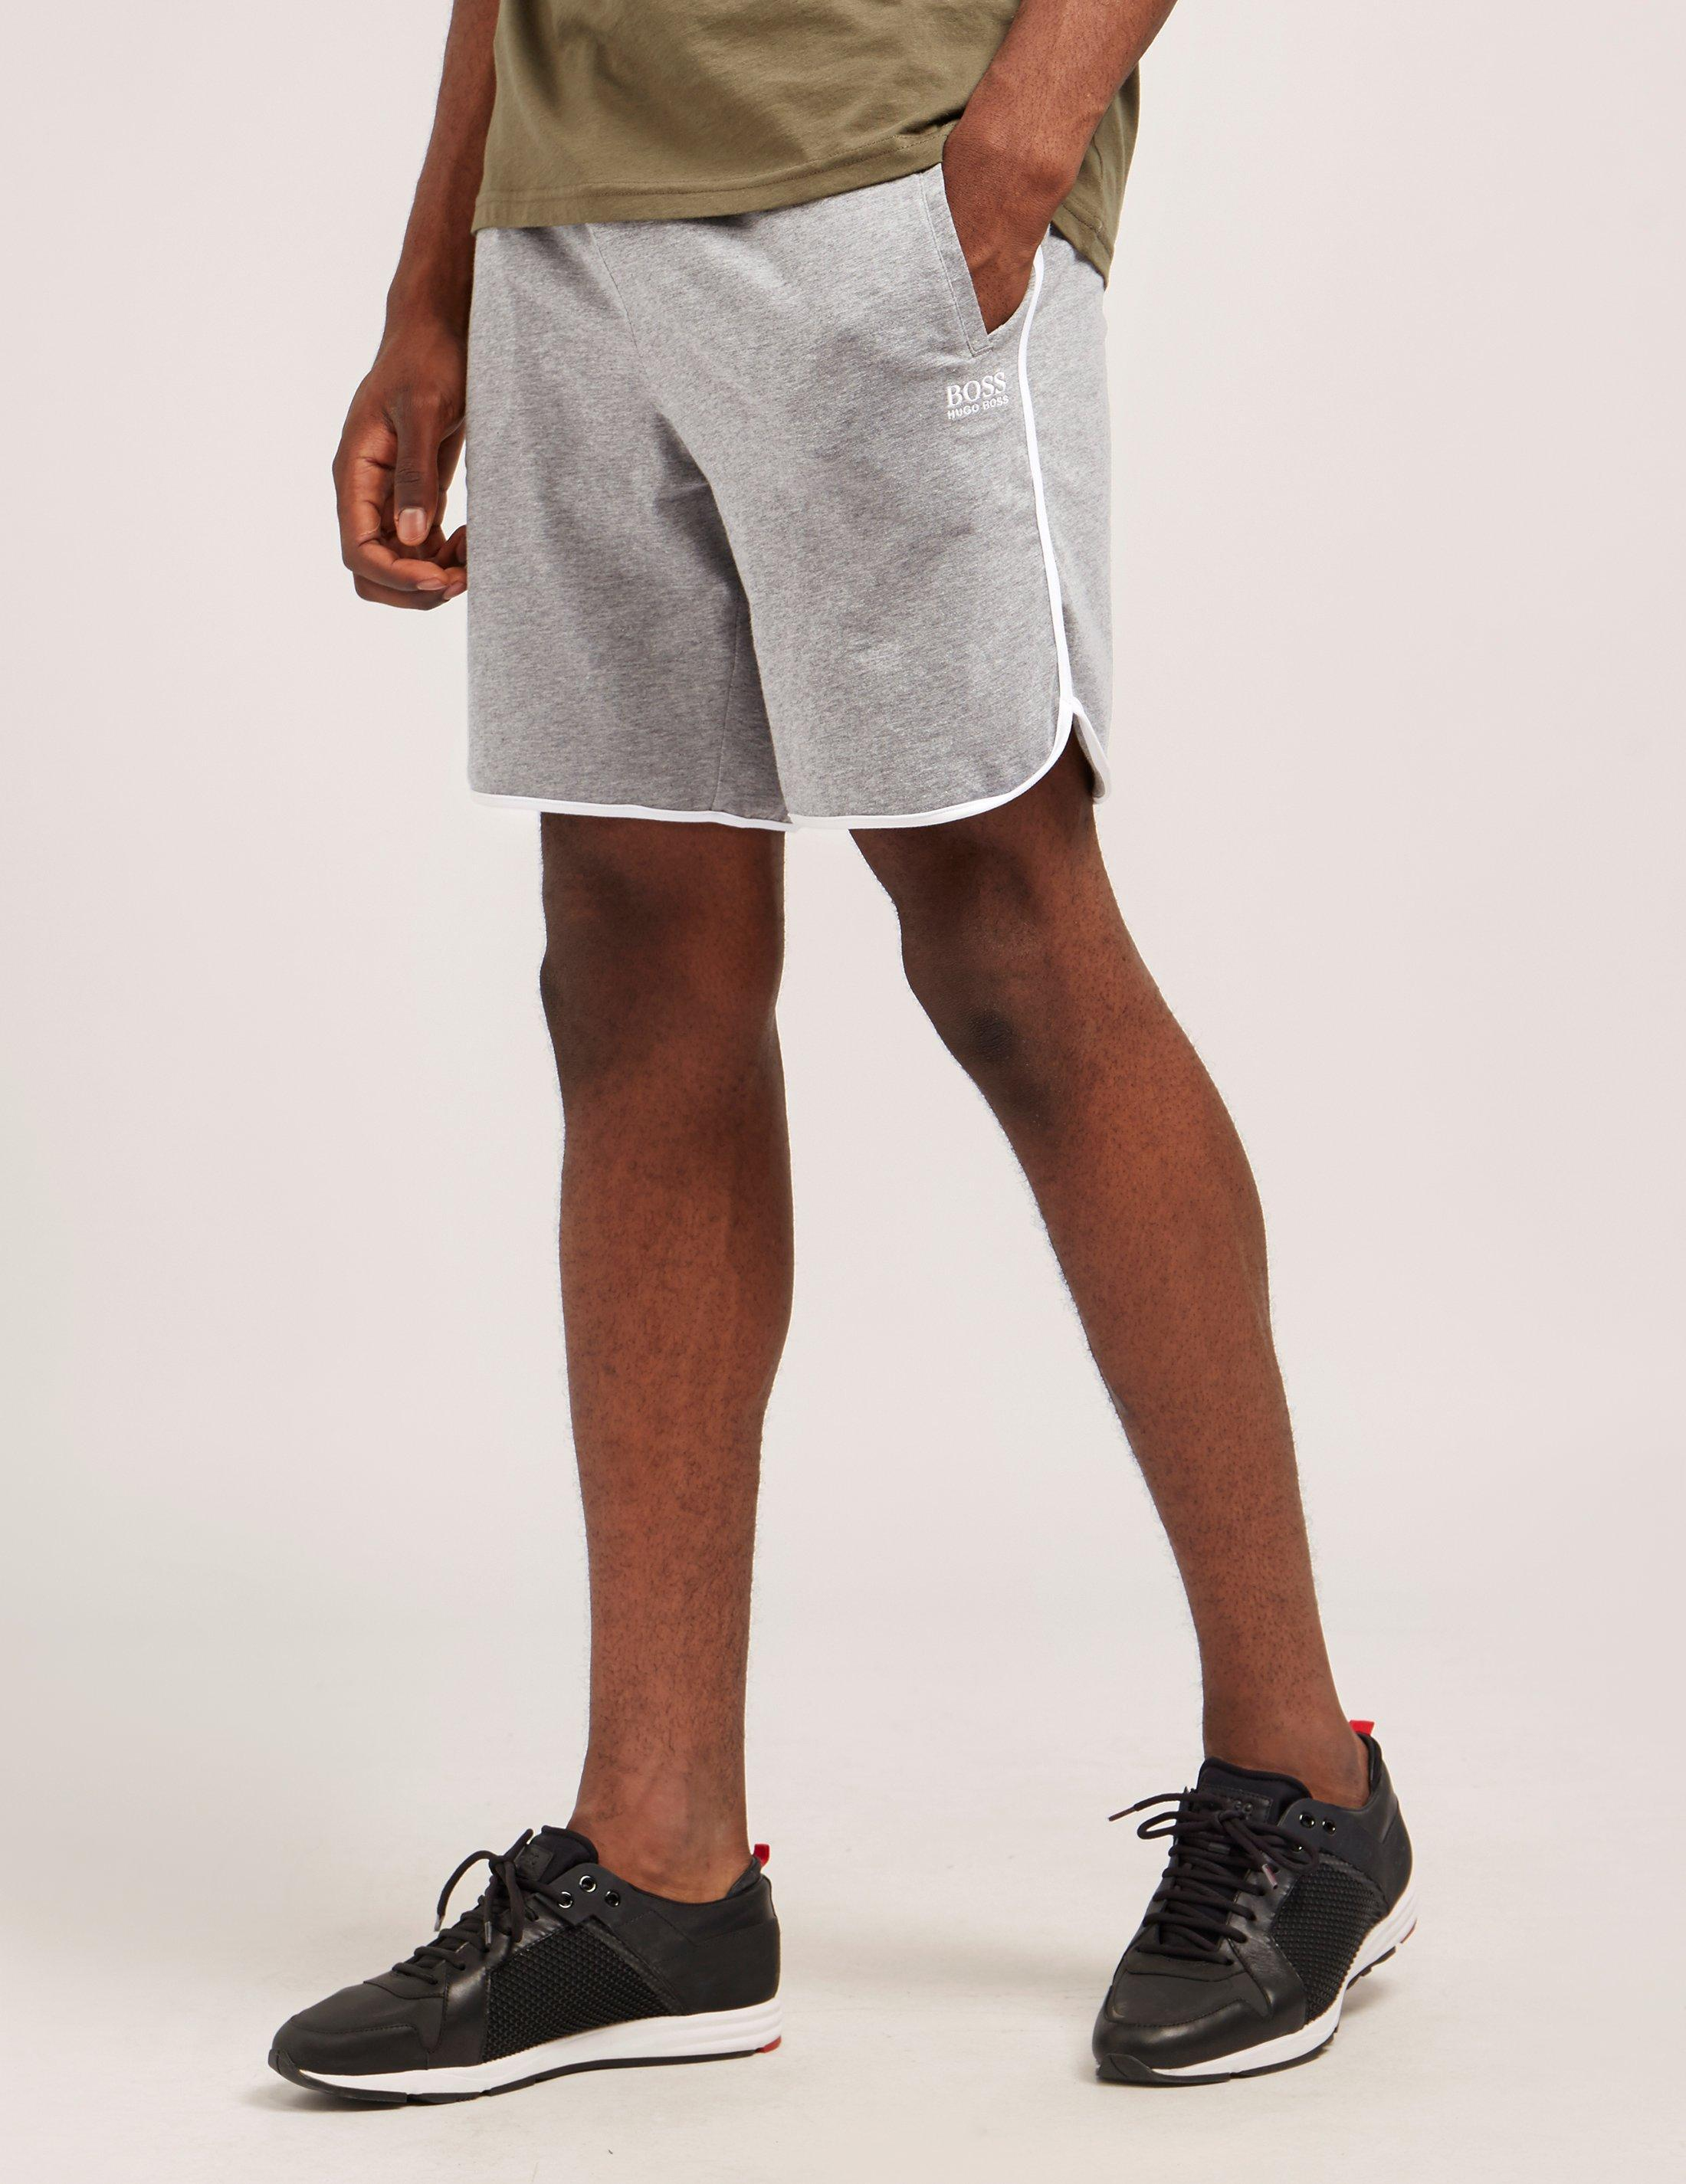 dcefba098 BOSS Logo Fleece Shorts Light Grey in Gray for Men - Lyst